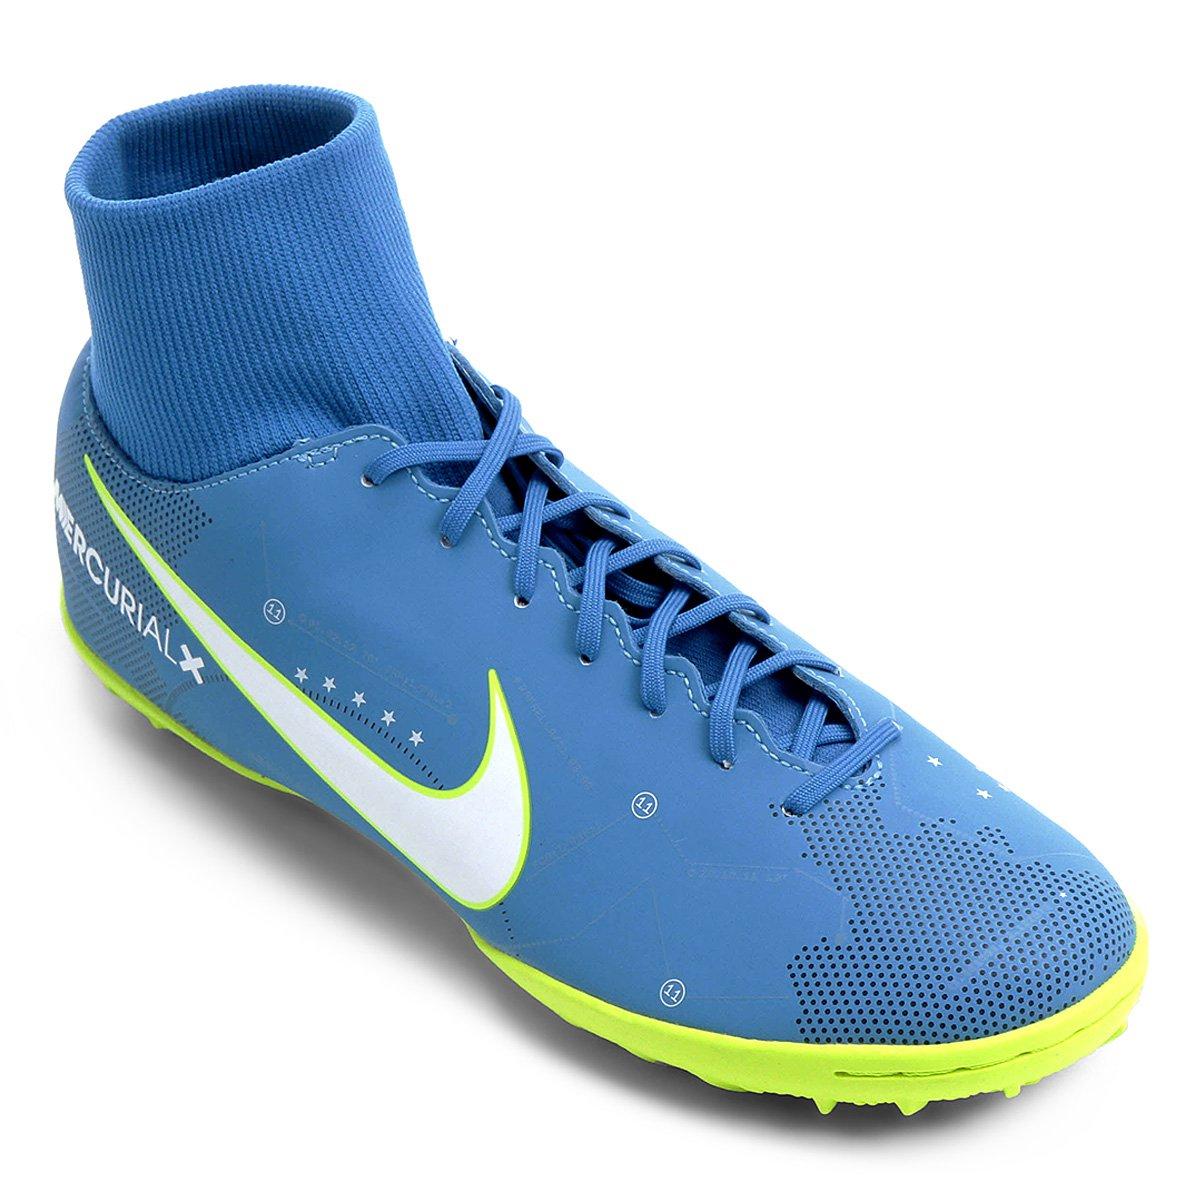 finest selection 028dc fecc4 Chuteira Society Nike Mercurial Victory 6 DF Neymar Jr TF - Azul e Branco